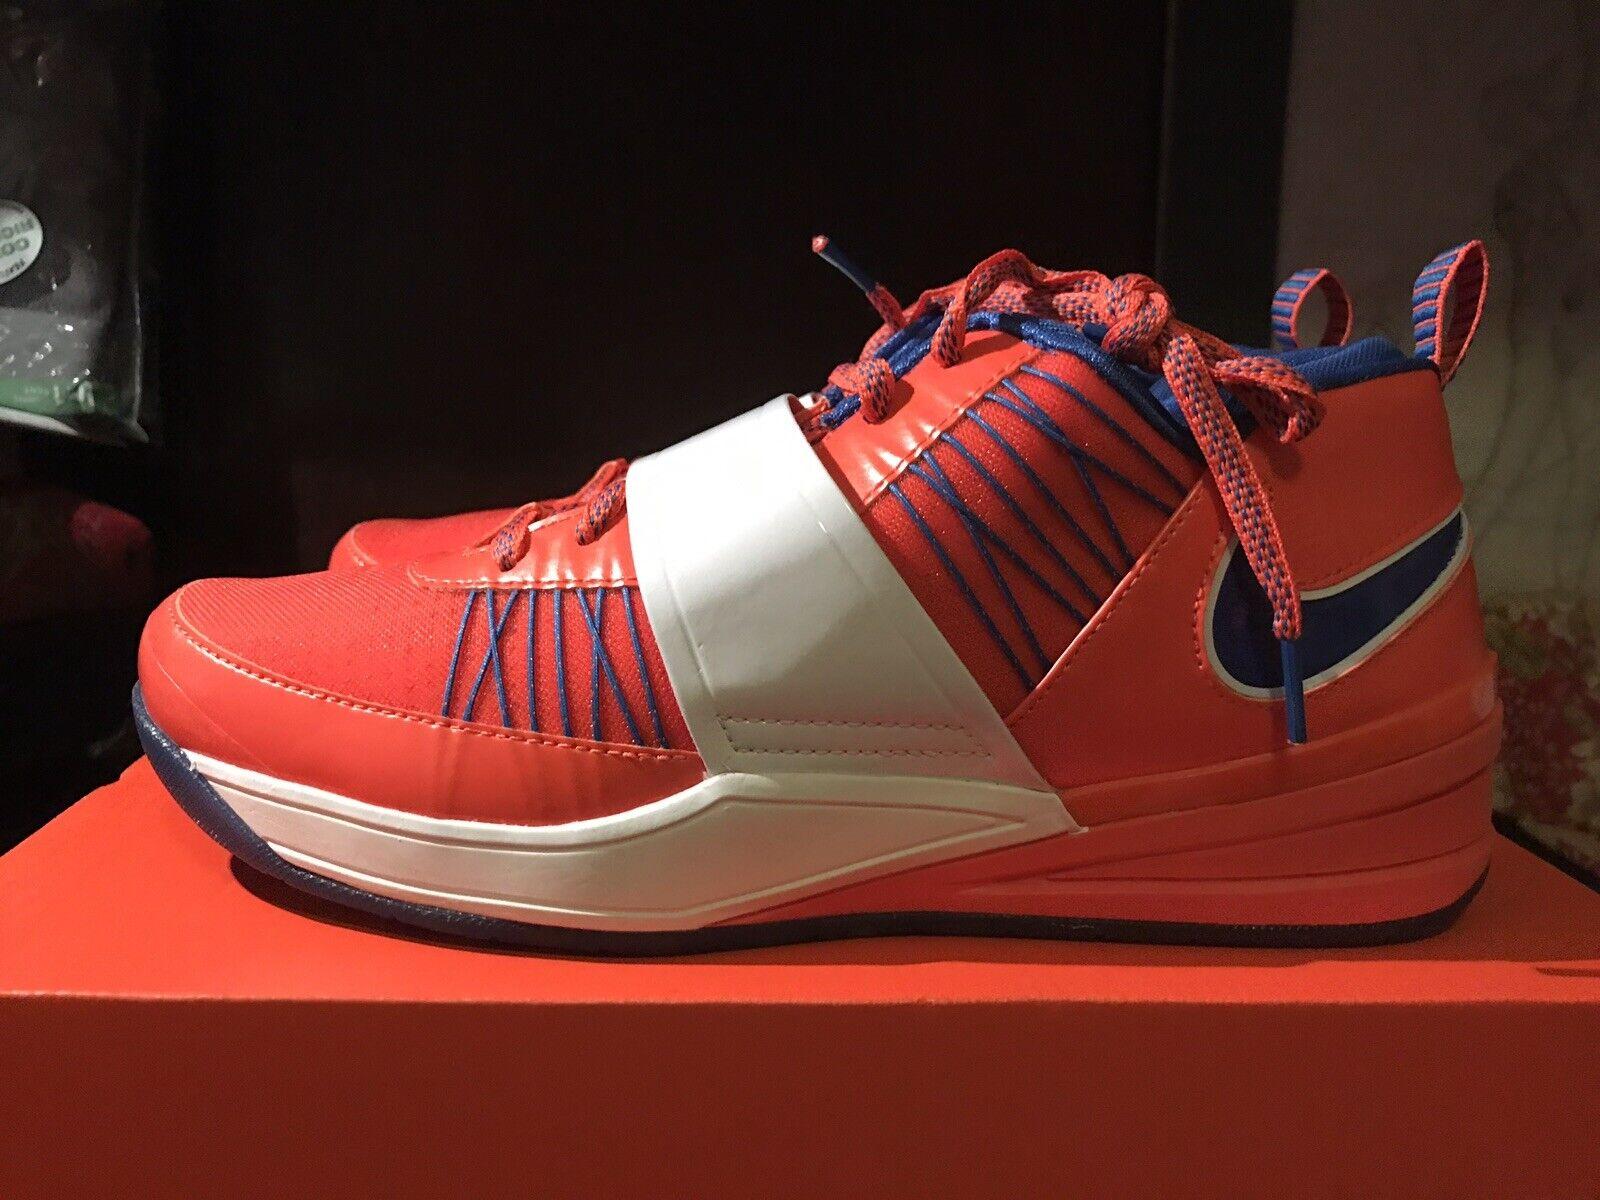 Nike Air Zoom Revis Knicks NYC Brand New  RARE 9.5 DS Volt Fir Cool Grey Camo